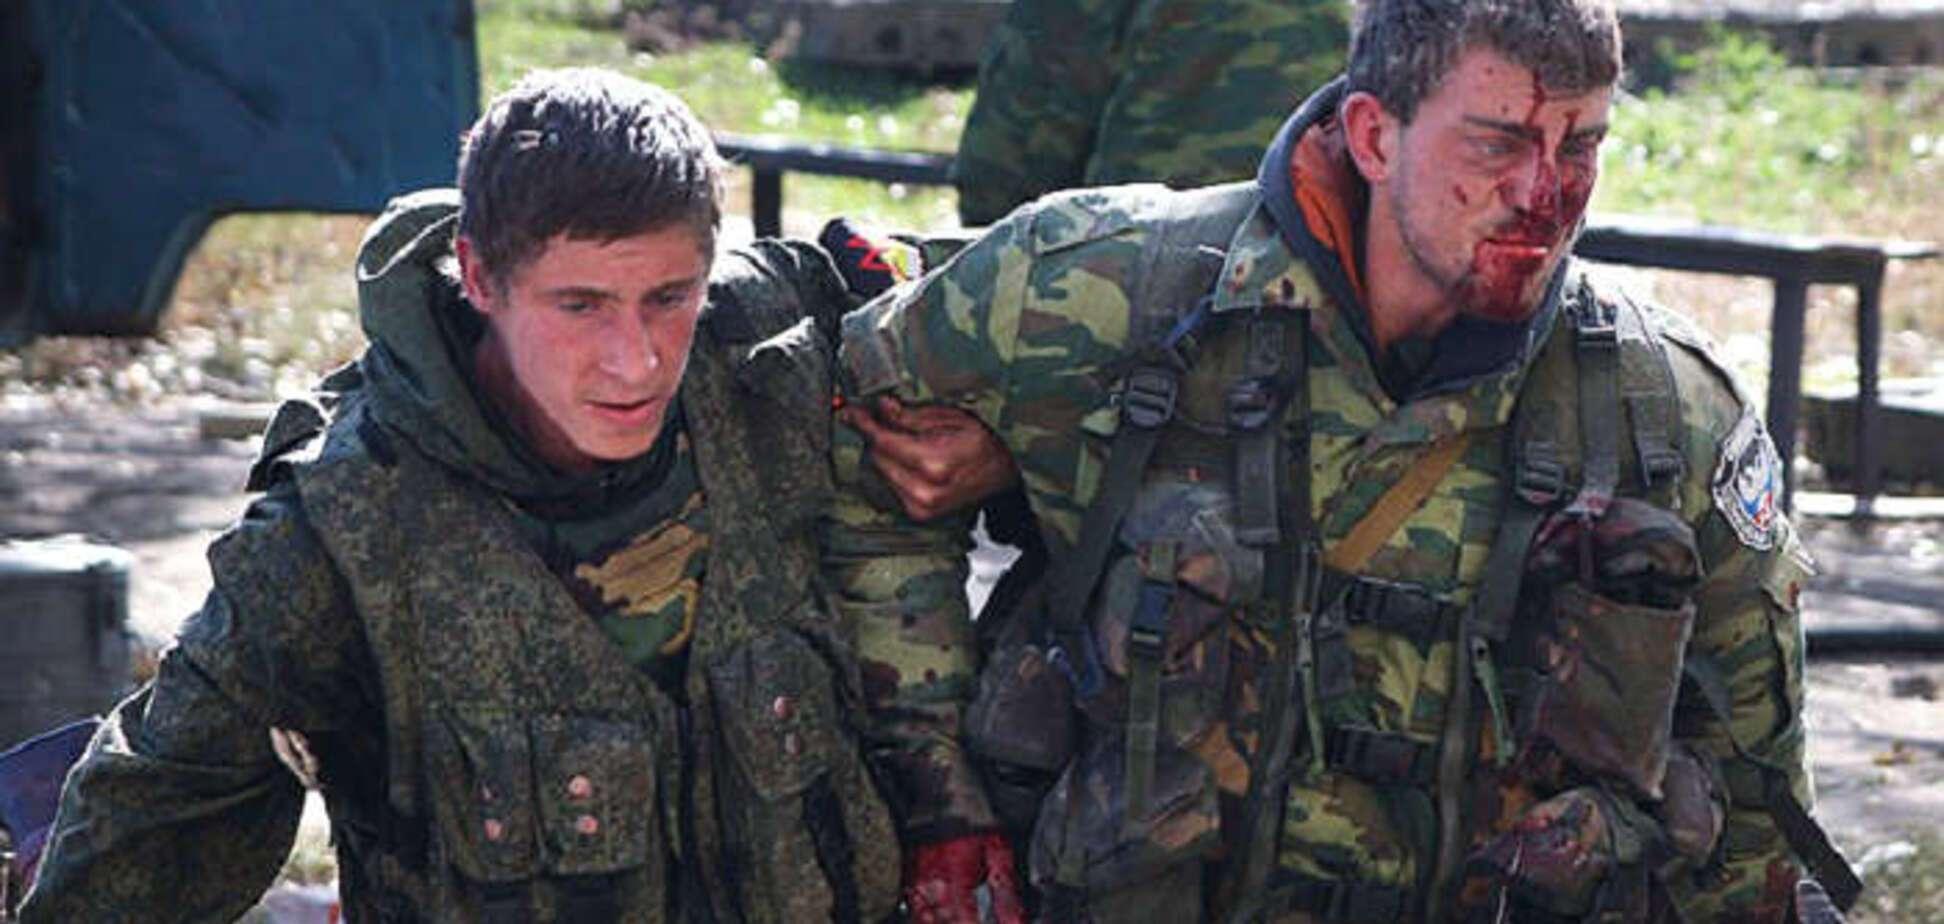 Перший пішов! Український воїн показав нового члена 'бригади-200' 'ДНР'